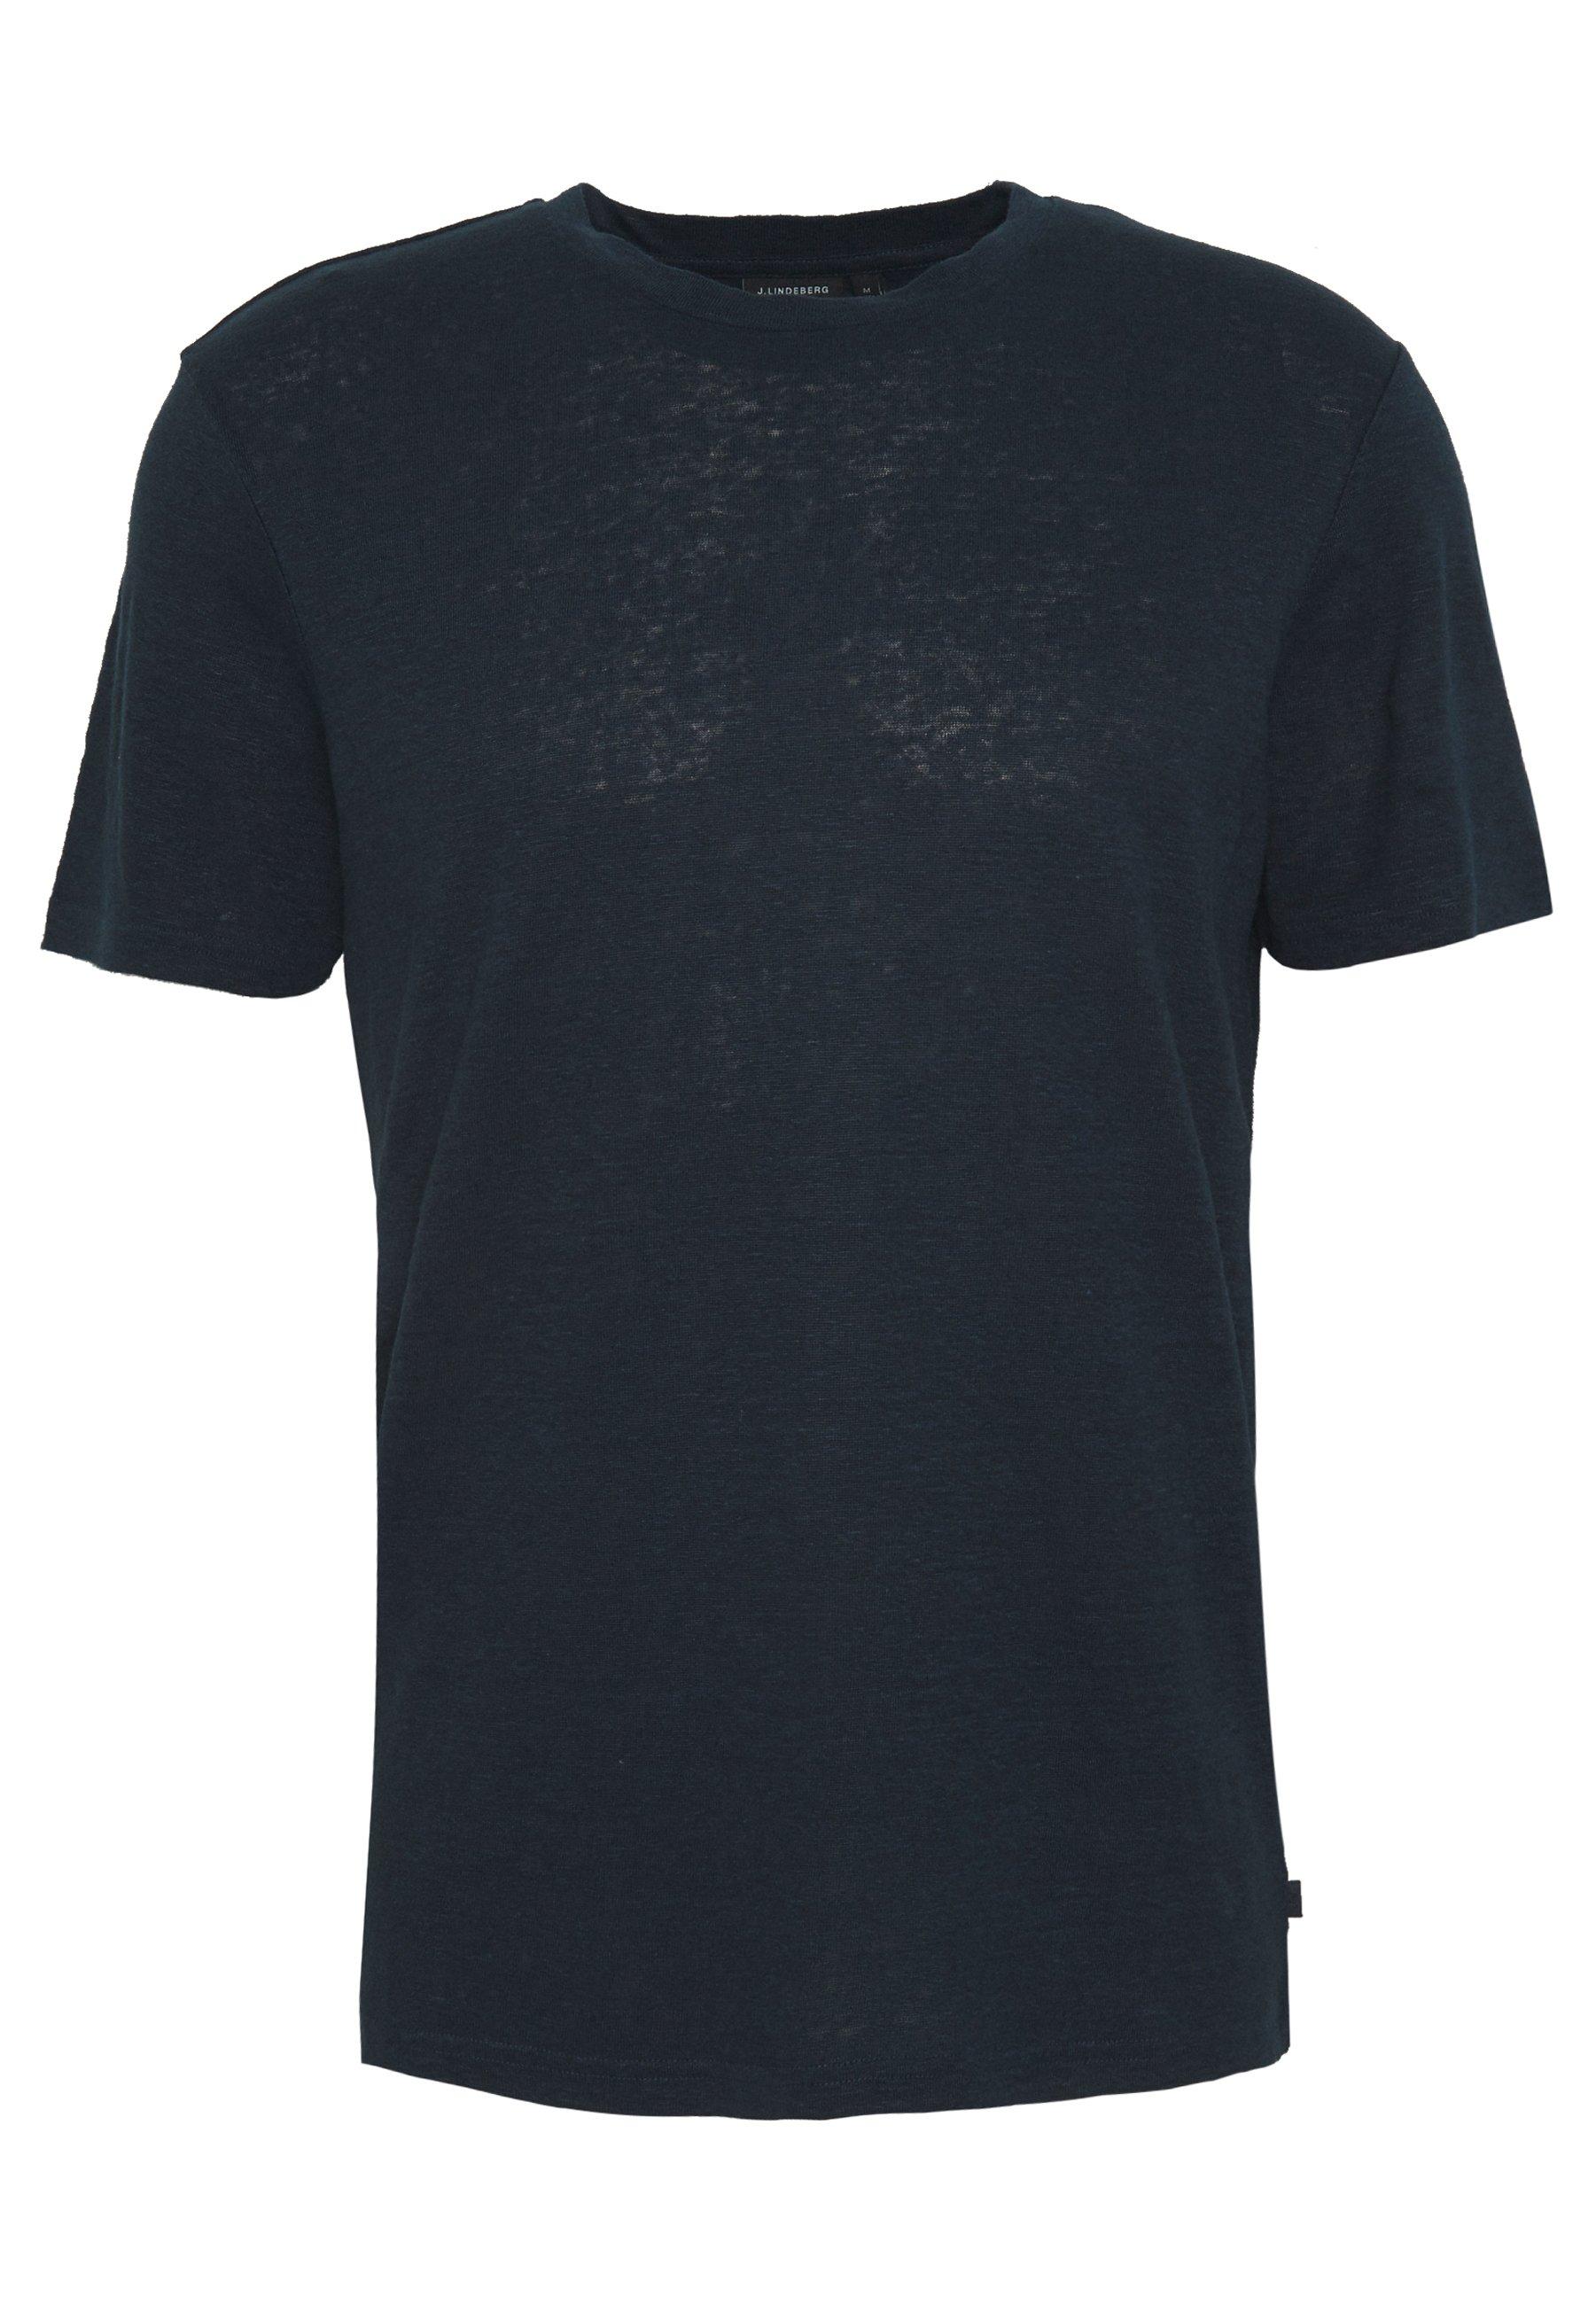 J.LINDEBERG COMA - T-shirt basique - navy